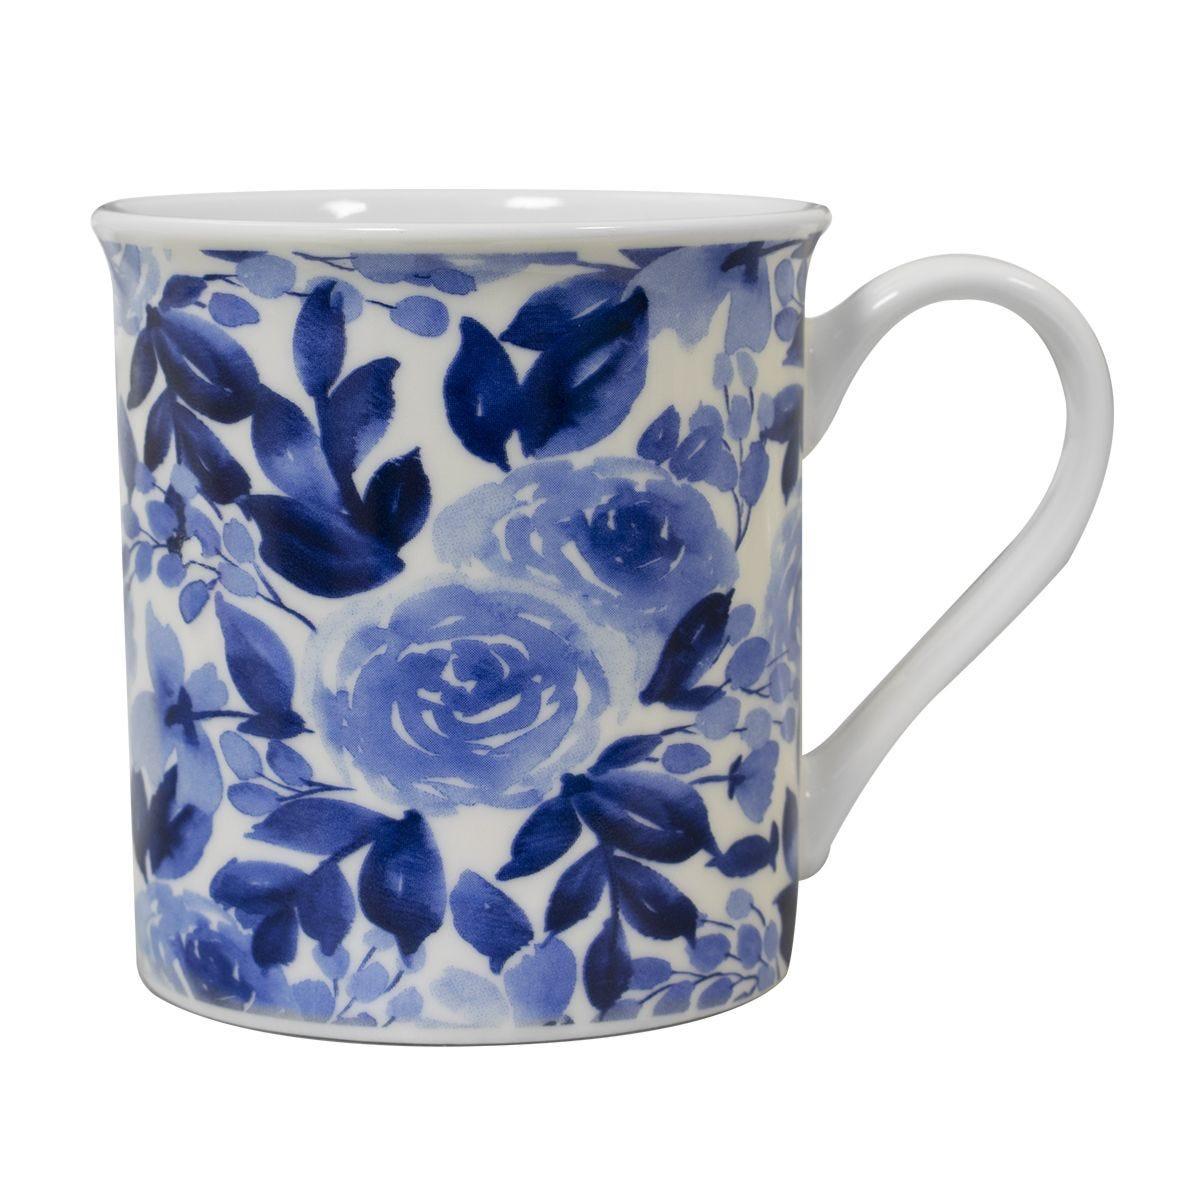 Floral Mug - Blue